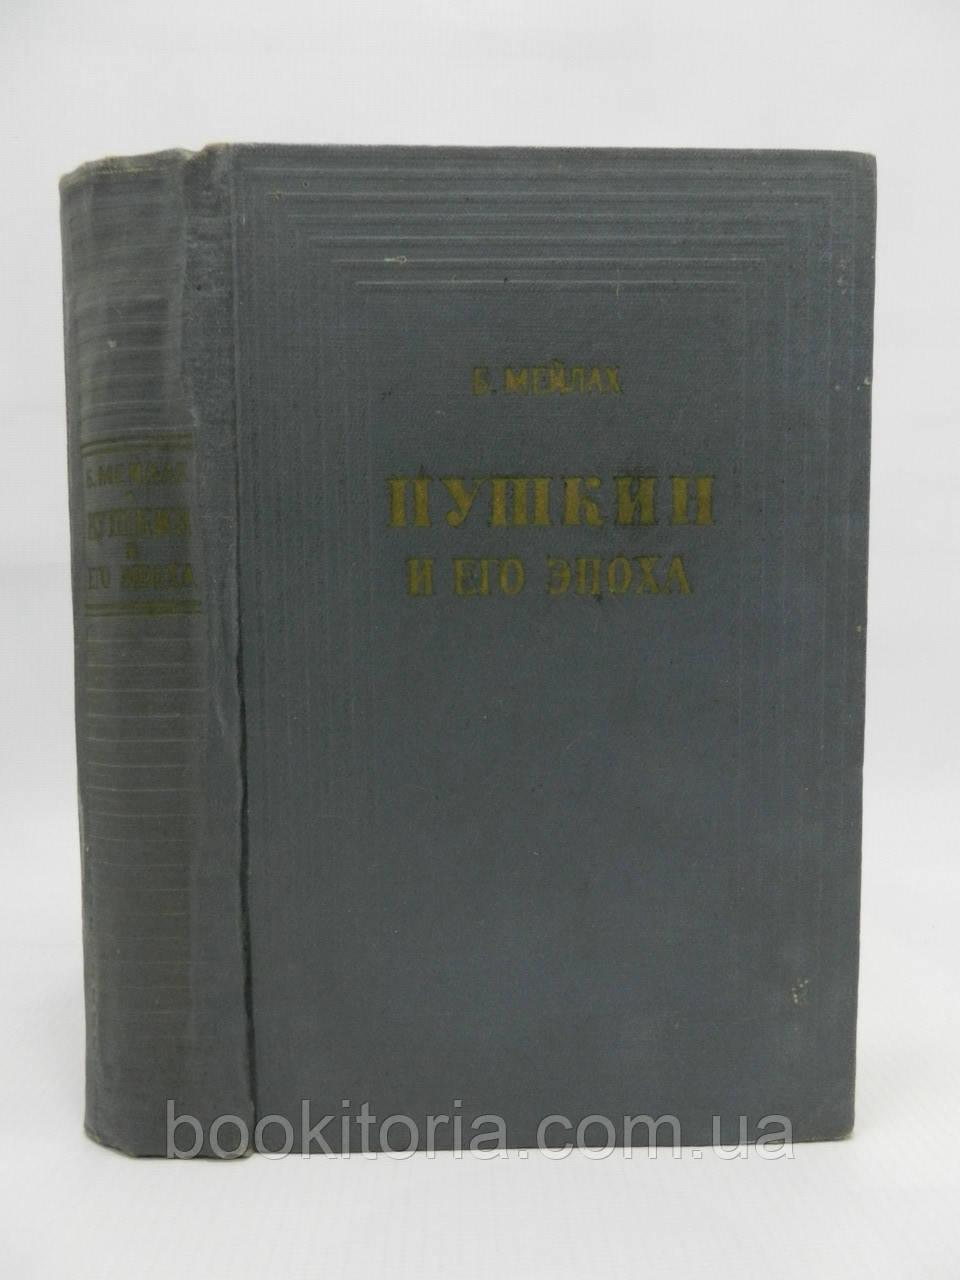 Мейлах Б. Пушкин и его эпоха (б/у).